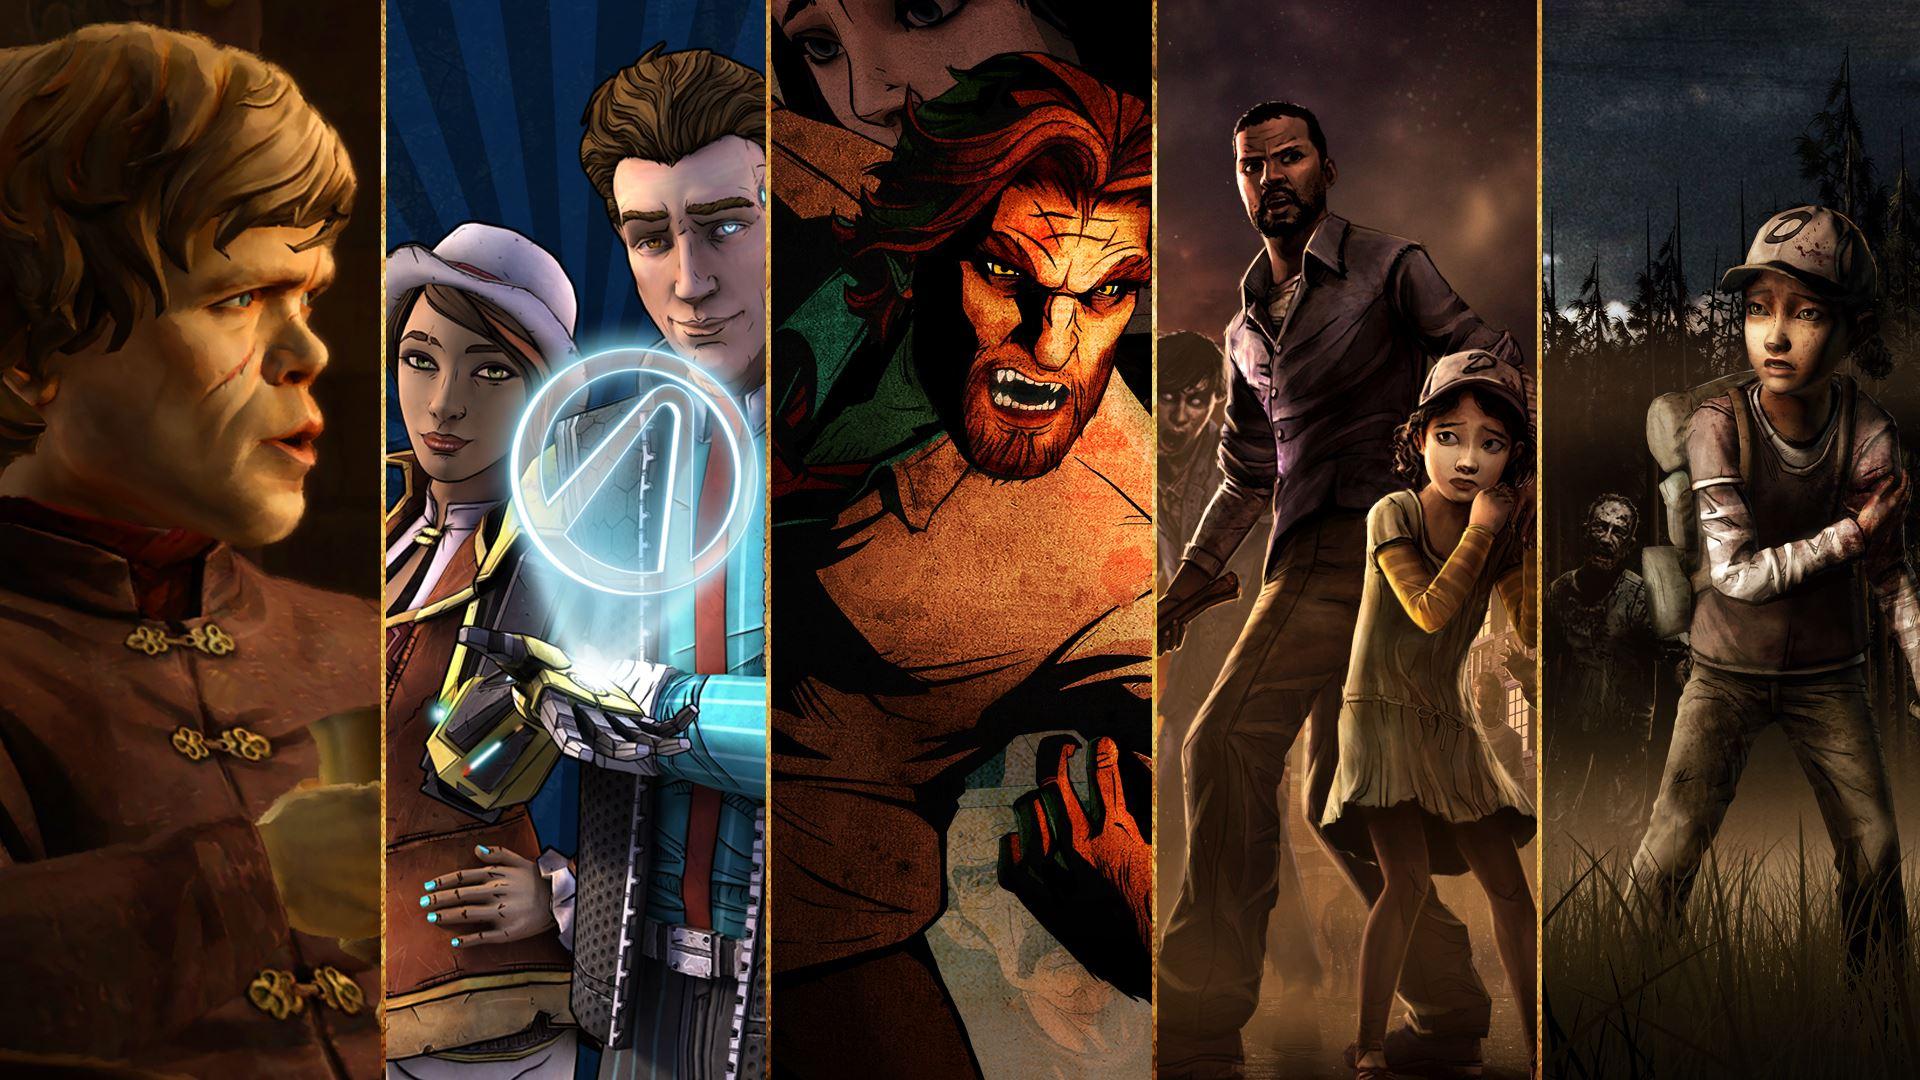 (iOS+Android) Telltale Sale auf fast alles, z.B. Monkey Island, Mr. Robot, Batman, The Walking Dead, Game of Thrones, Jurassic Park... (Sammeldeal)